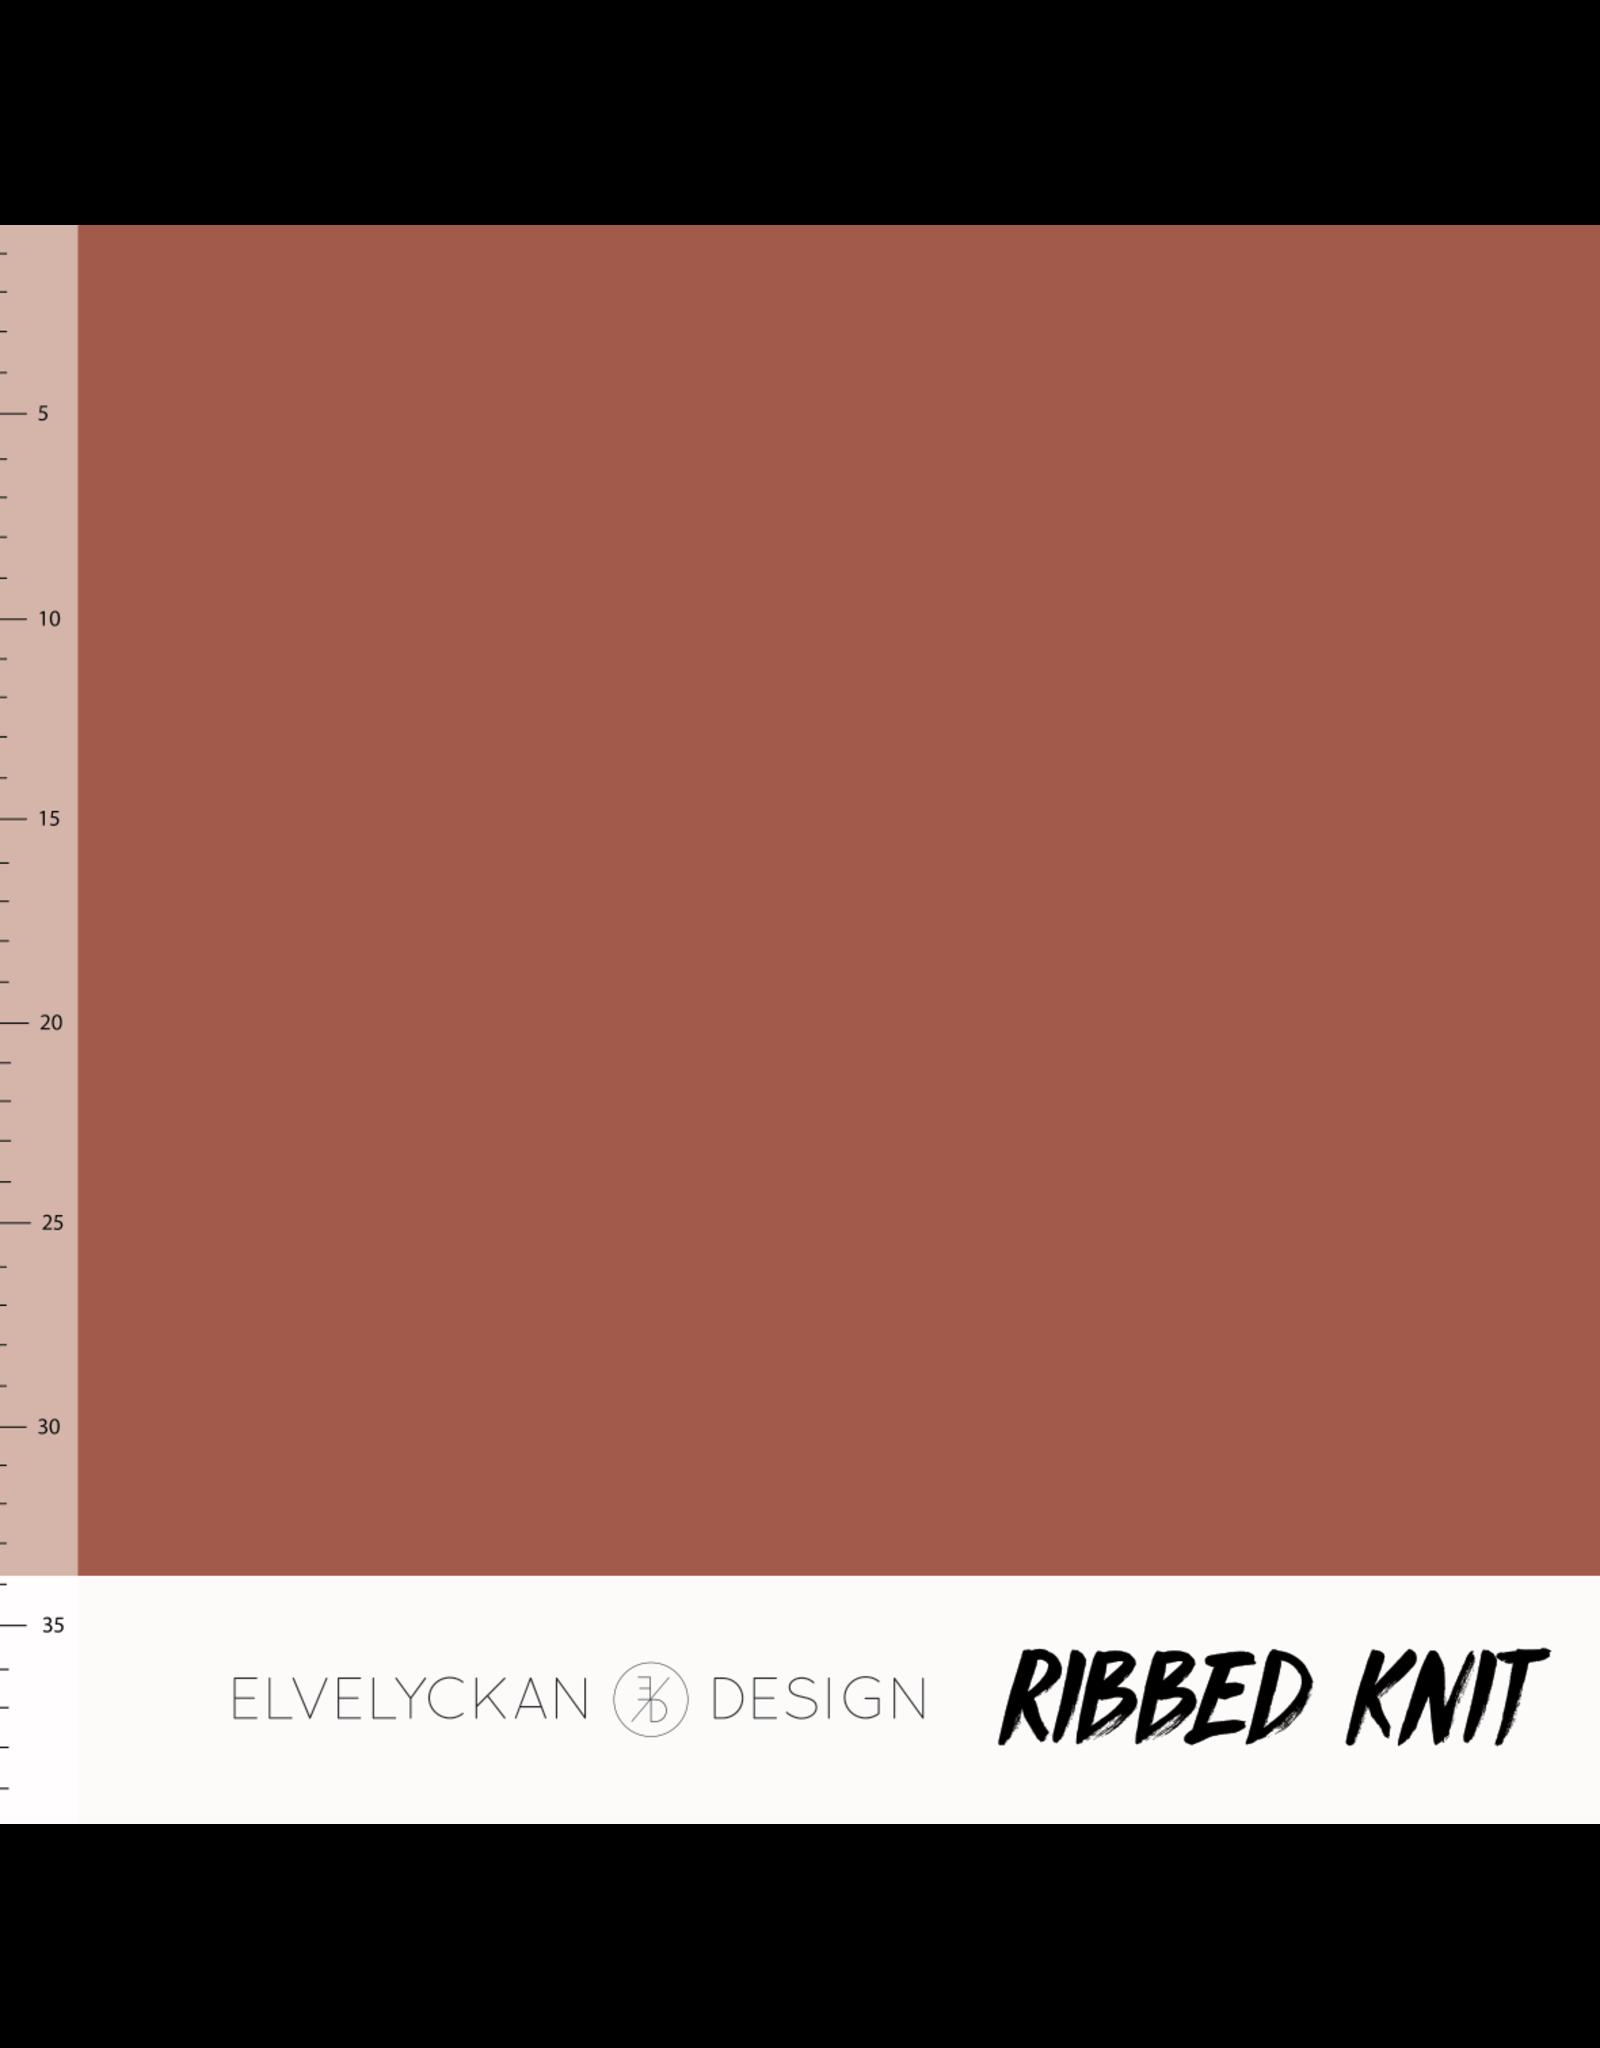 Elvelyckan ribbed knit rusty